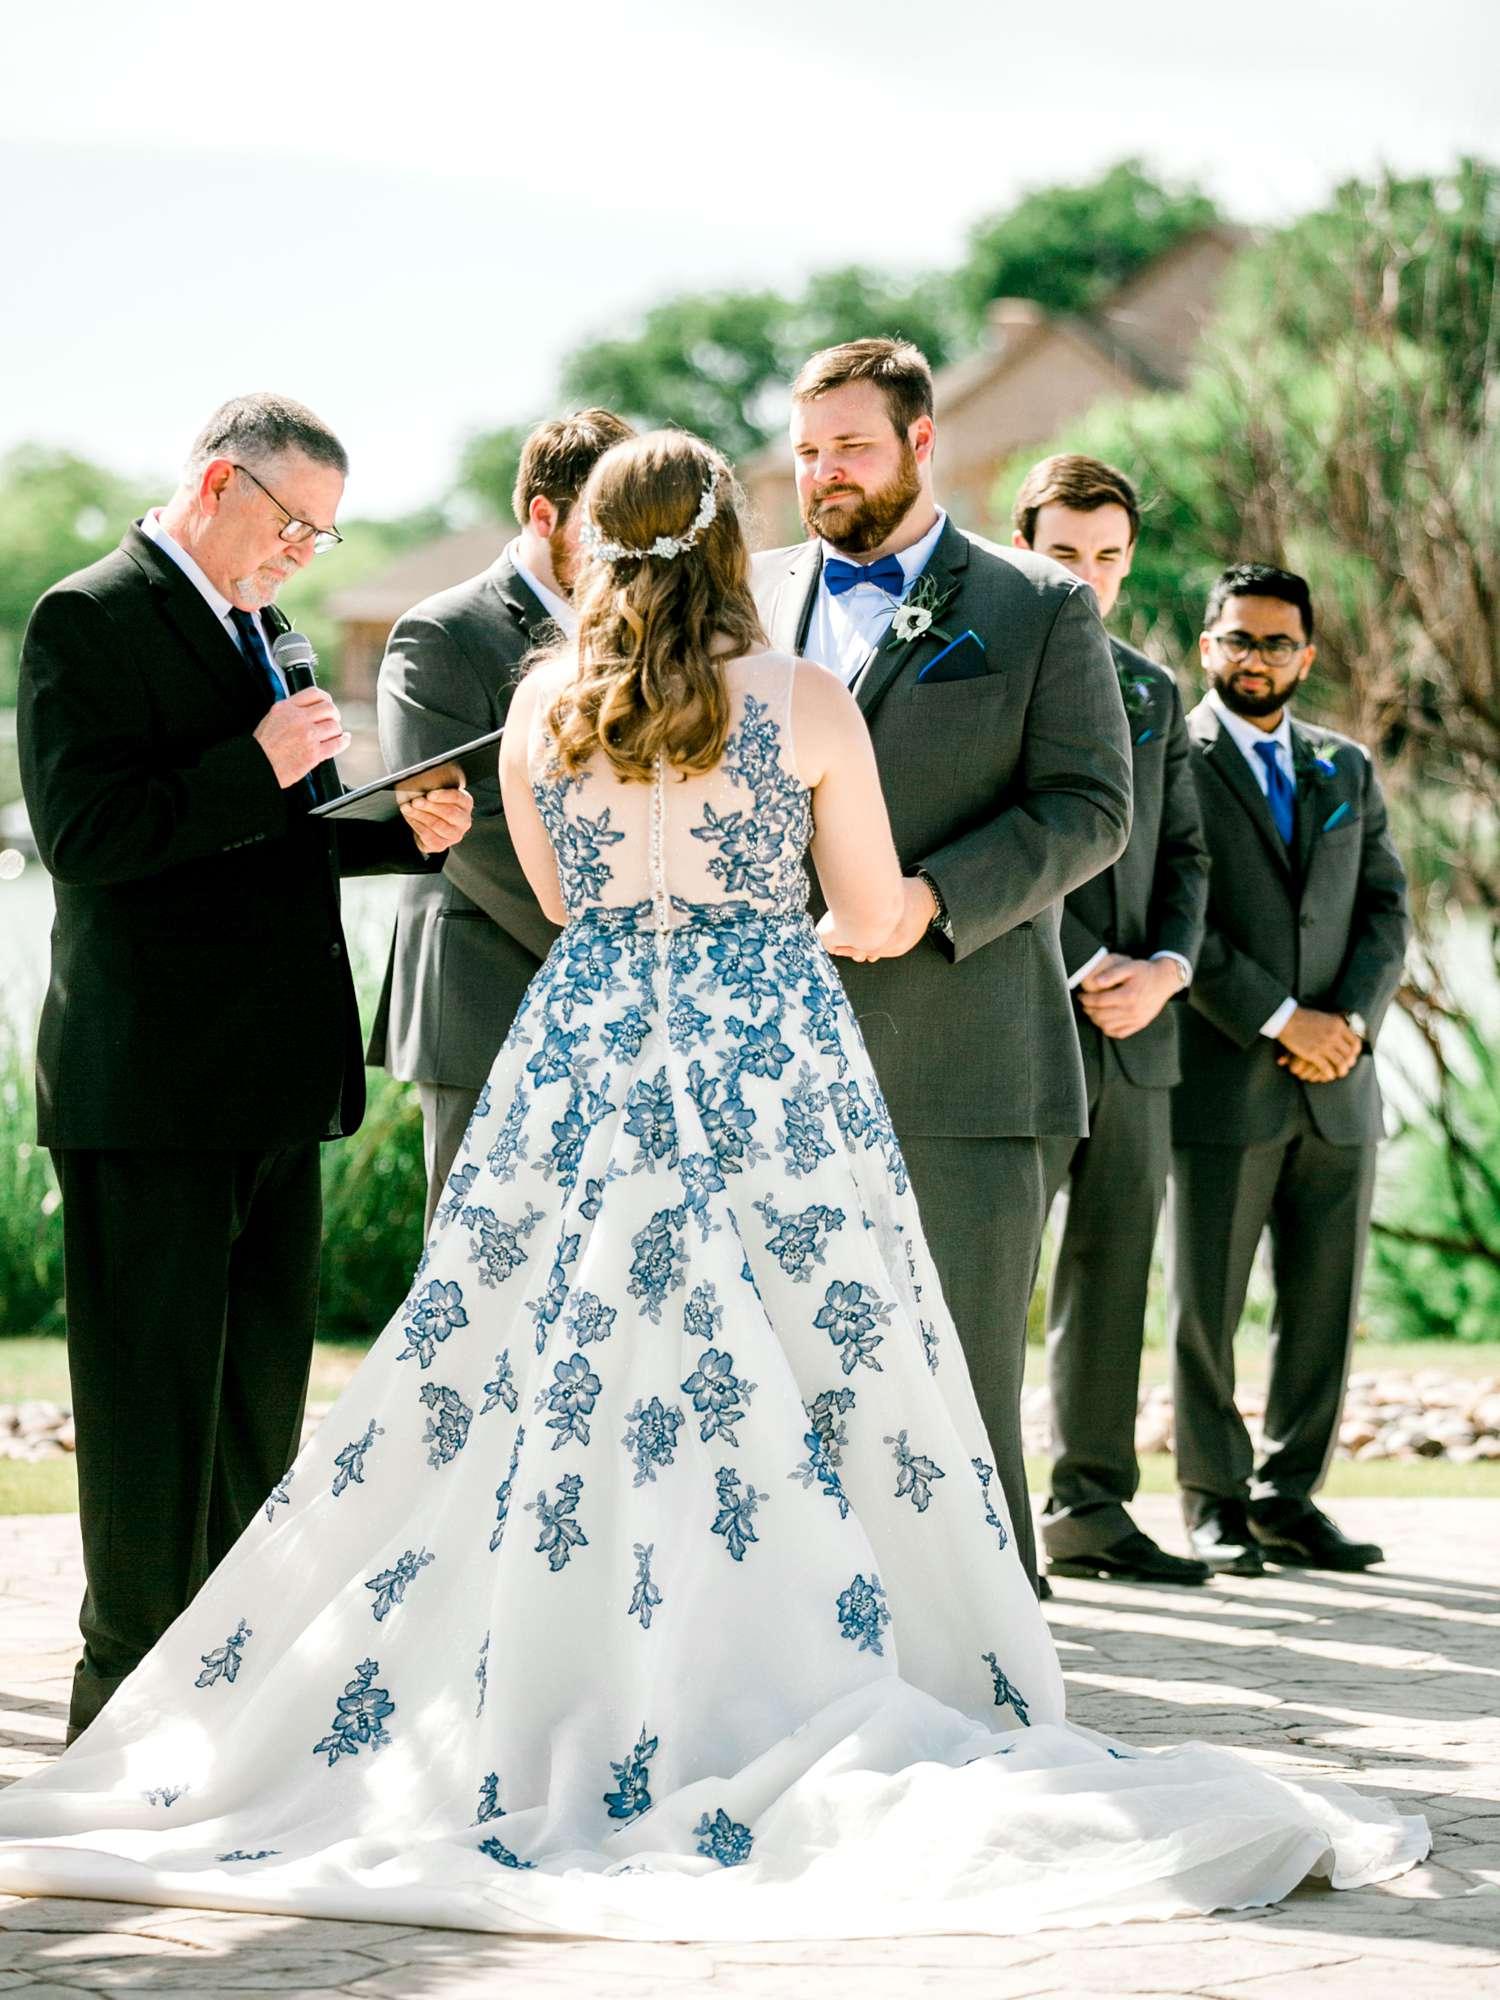 TY+NATHAN+HALLIER+ALLEEJ+WEDDING+PHOTOGRAPHER+RANSOM+CANYON_0079.jpg